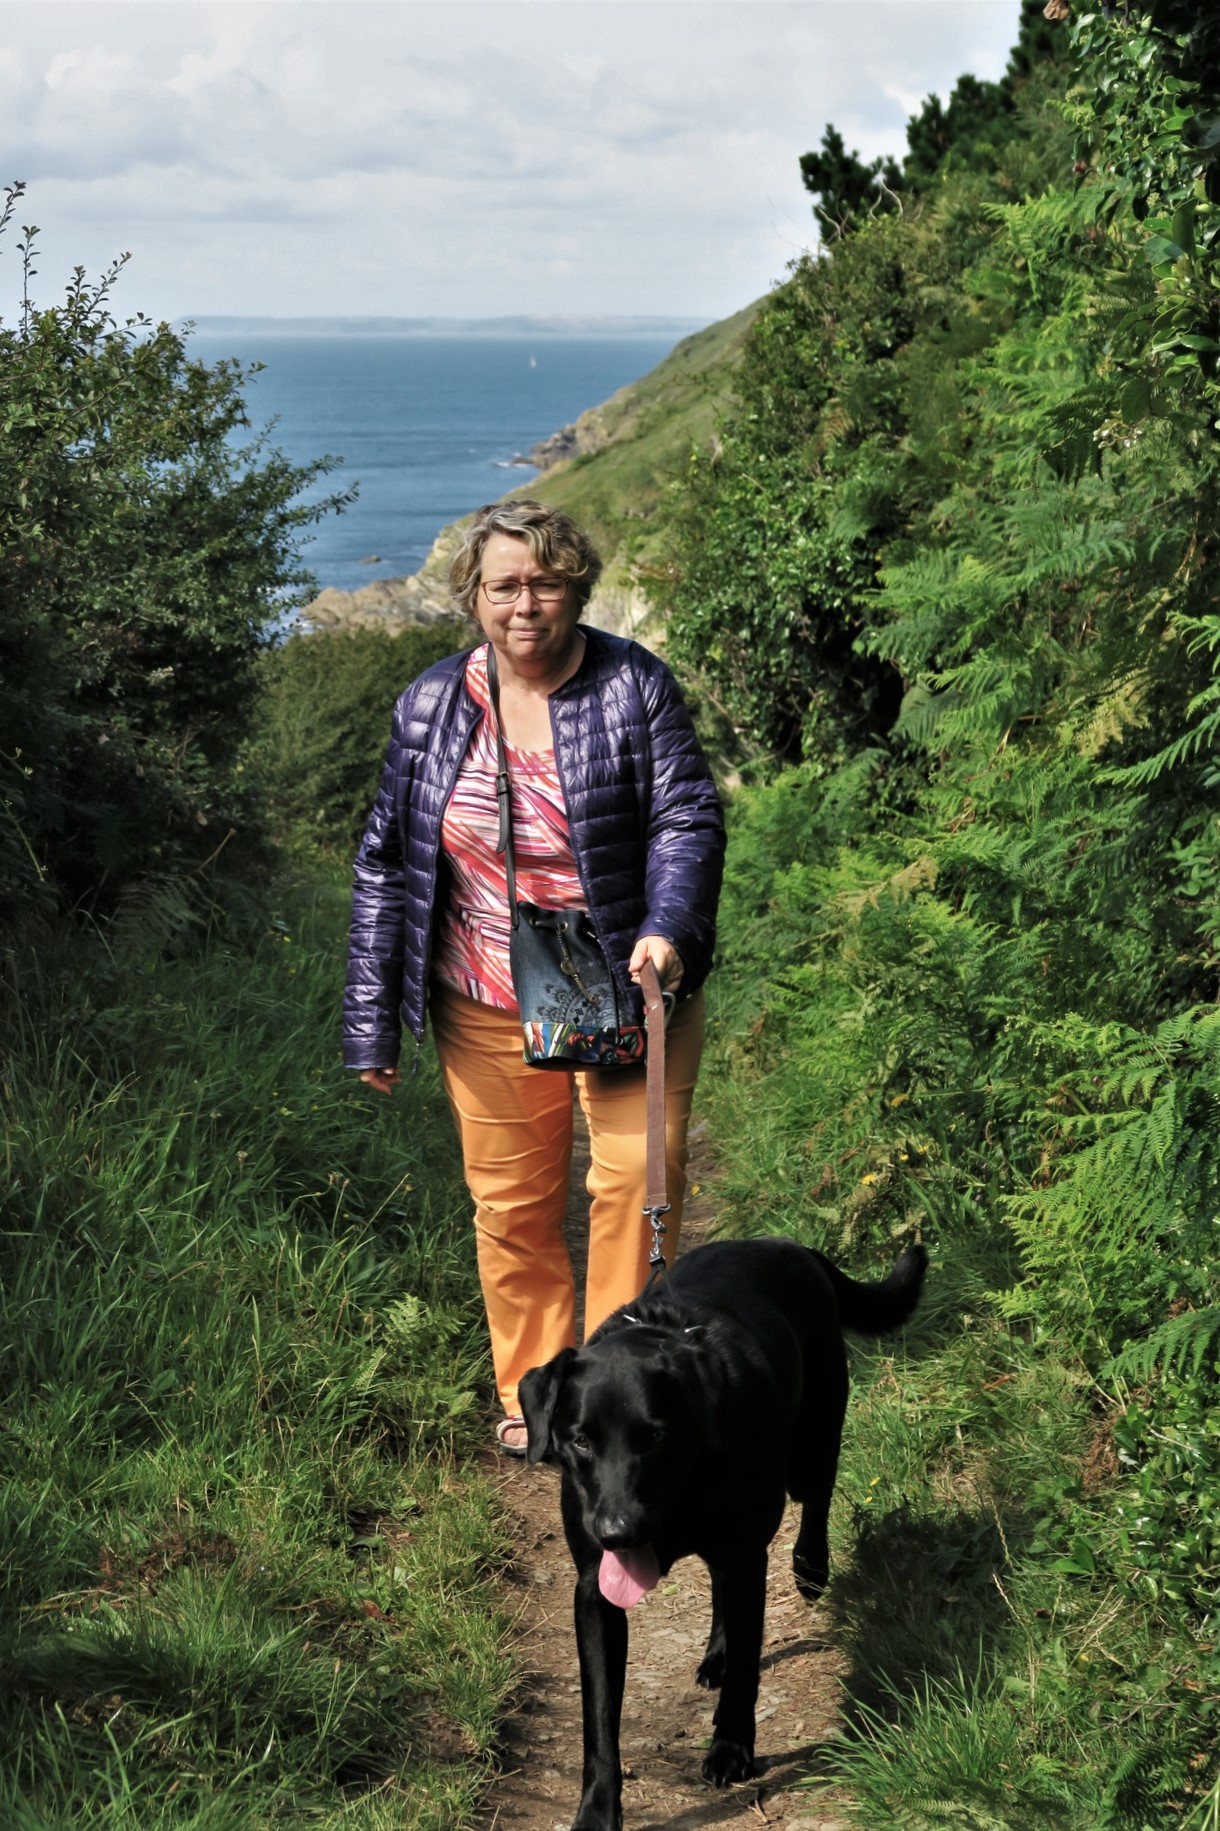 Wouafff : Sentier cotier au dessus de Polperro